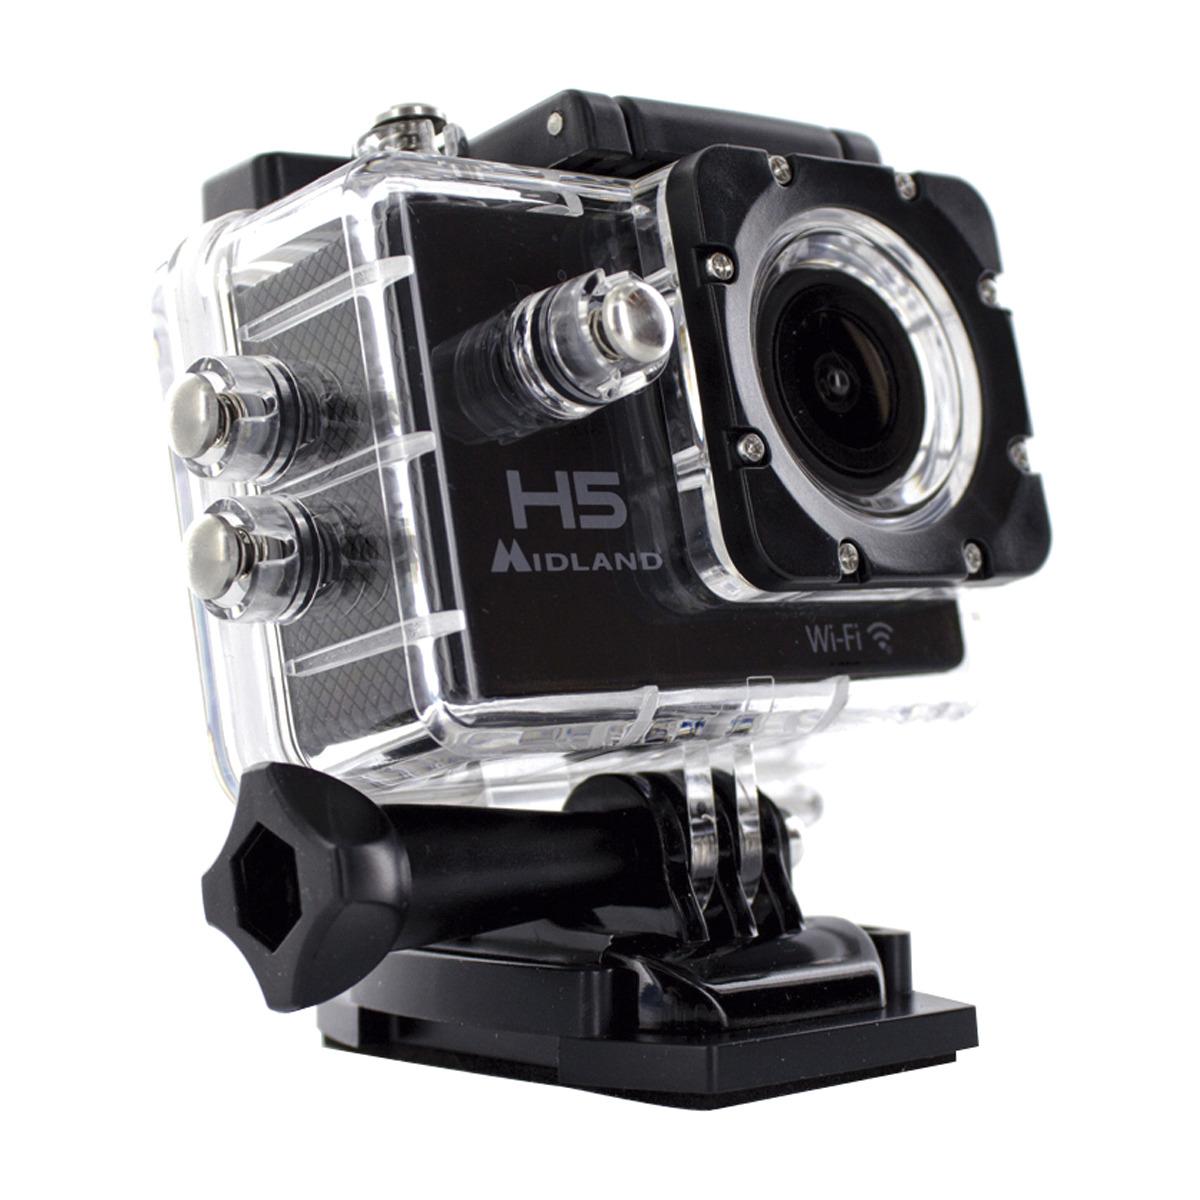 videocamara-midland-h5-full-hd